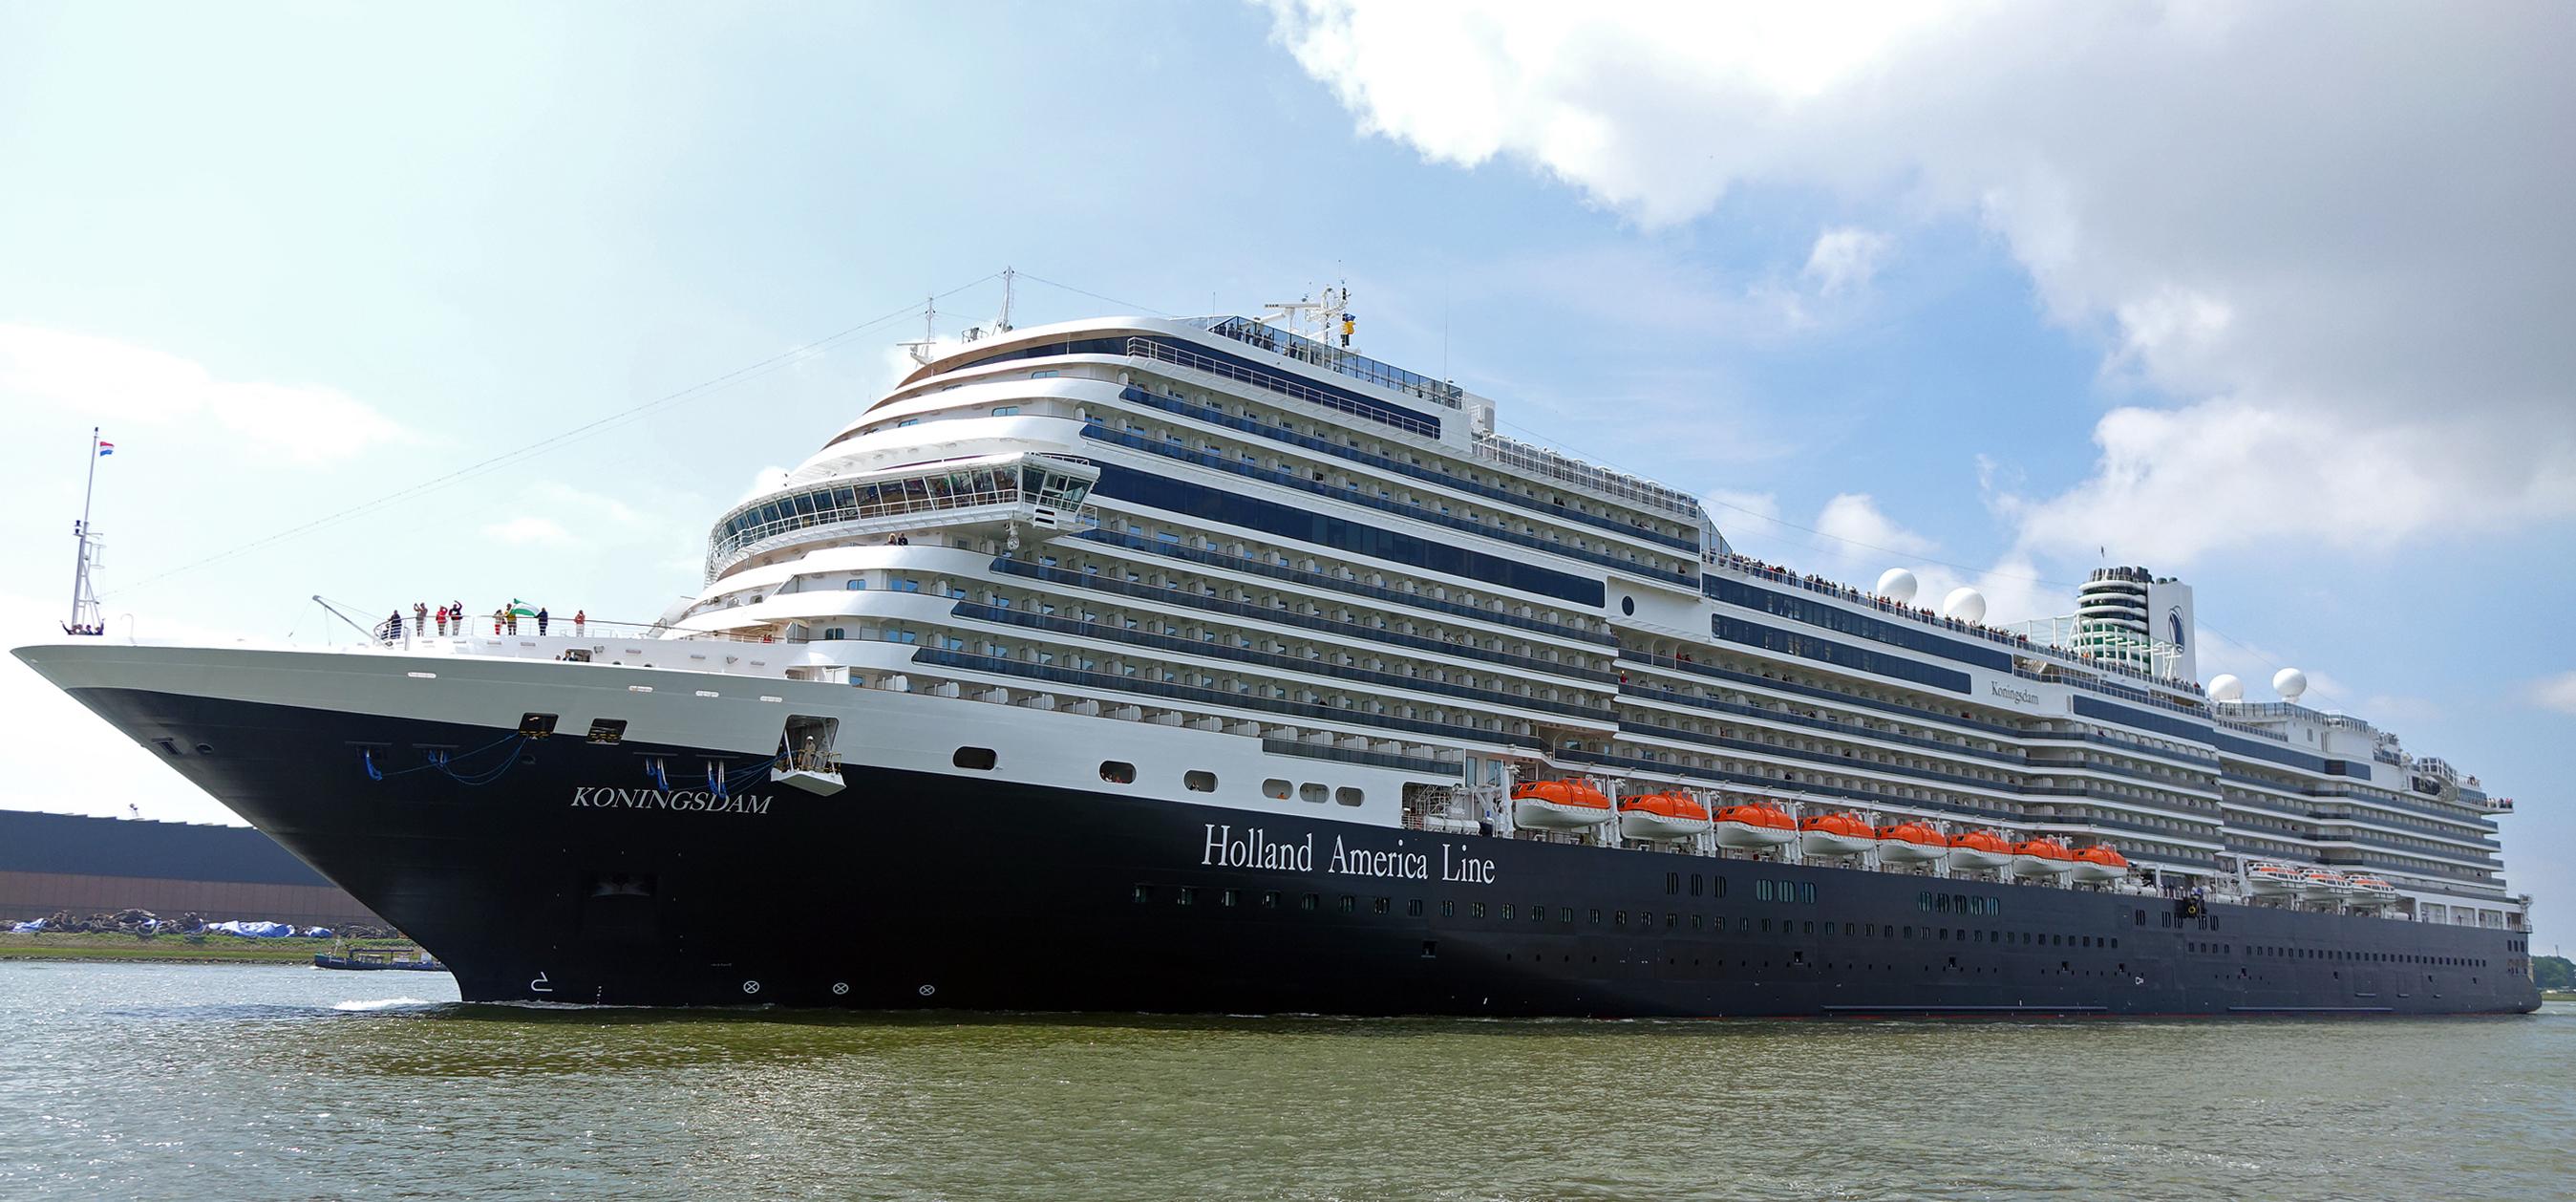 file koningsdam ship 2016 003     wikimedia commons